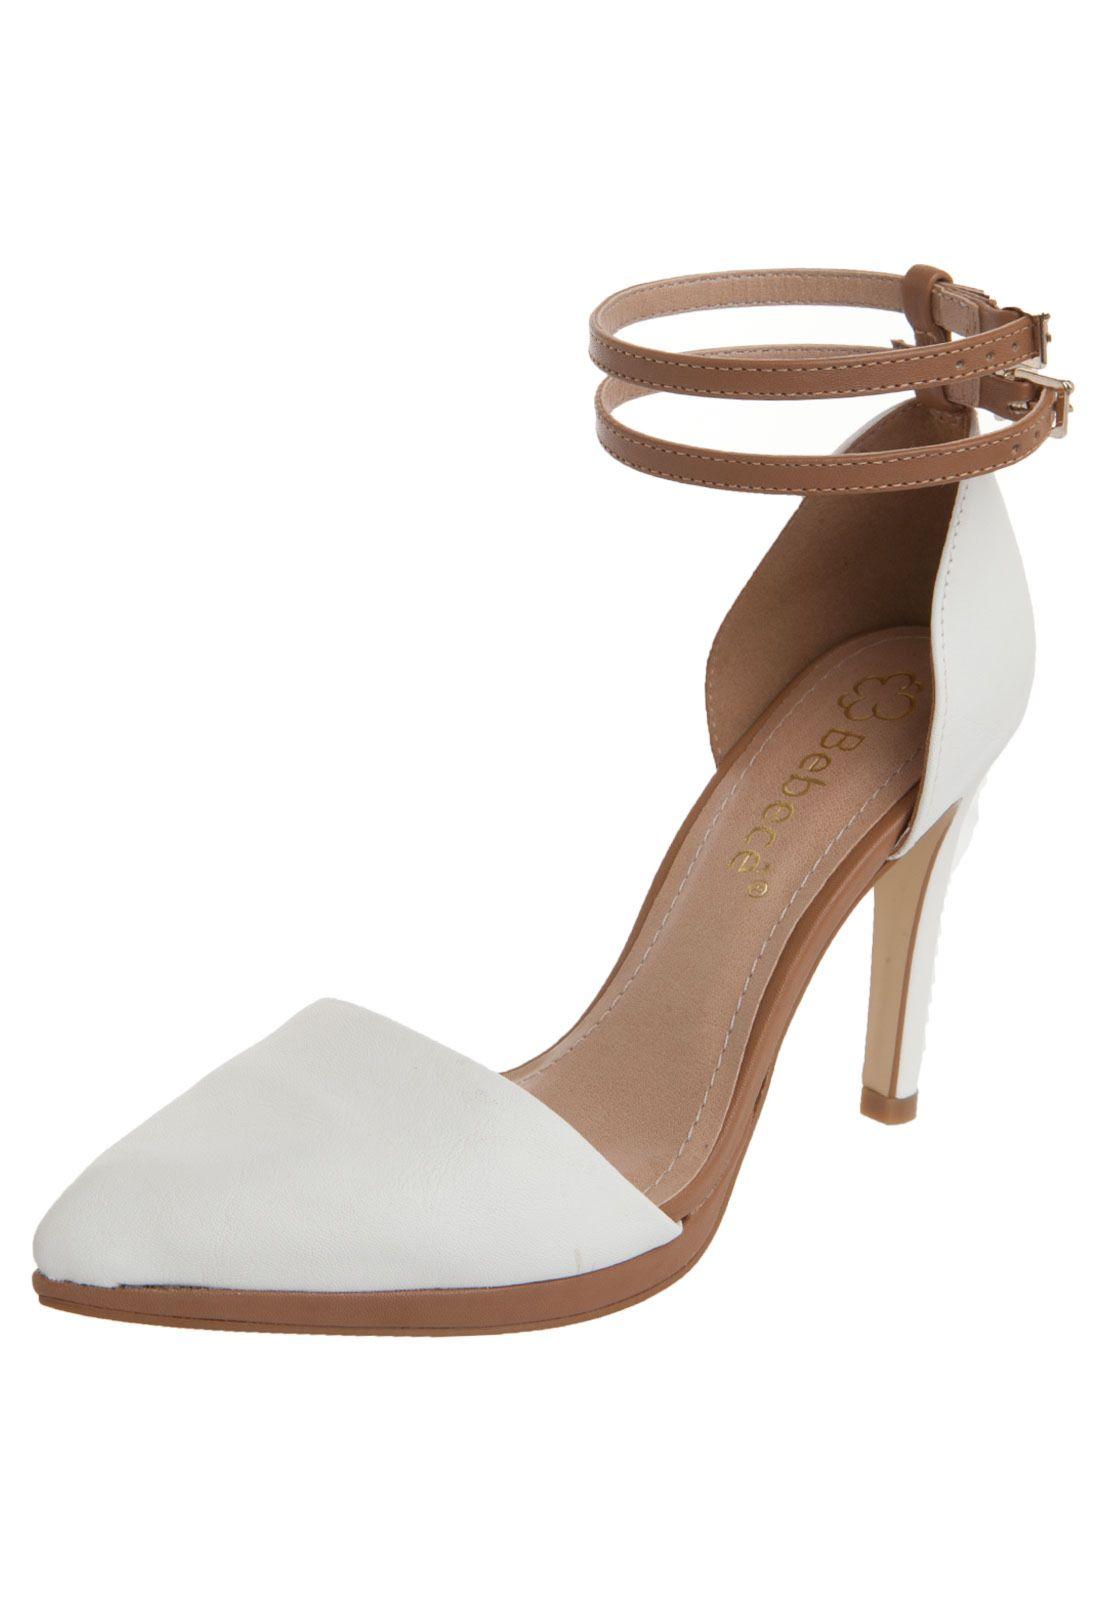 Sapato Feminino Sola Vermelha Marca Famosa Frete Gratis R